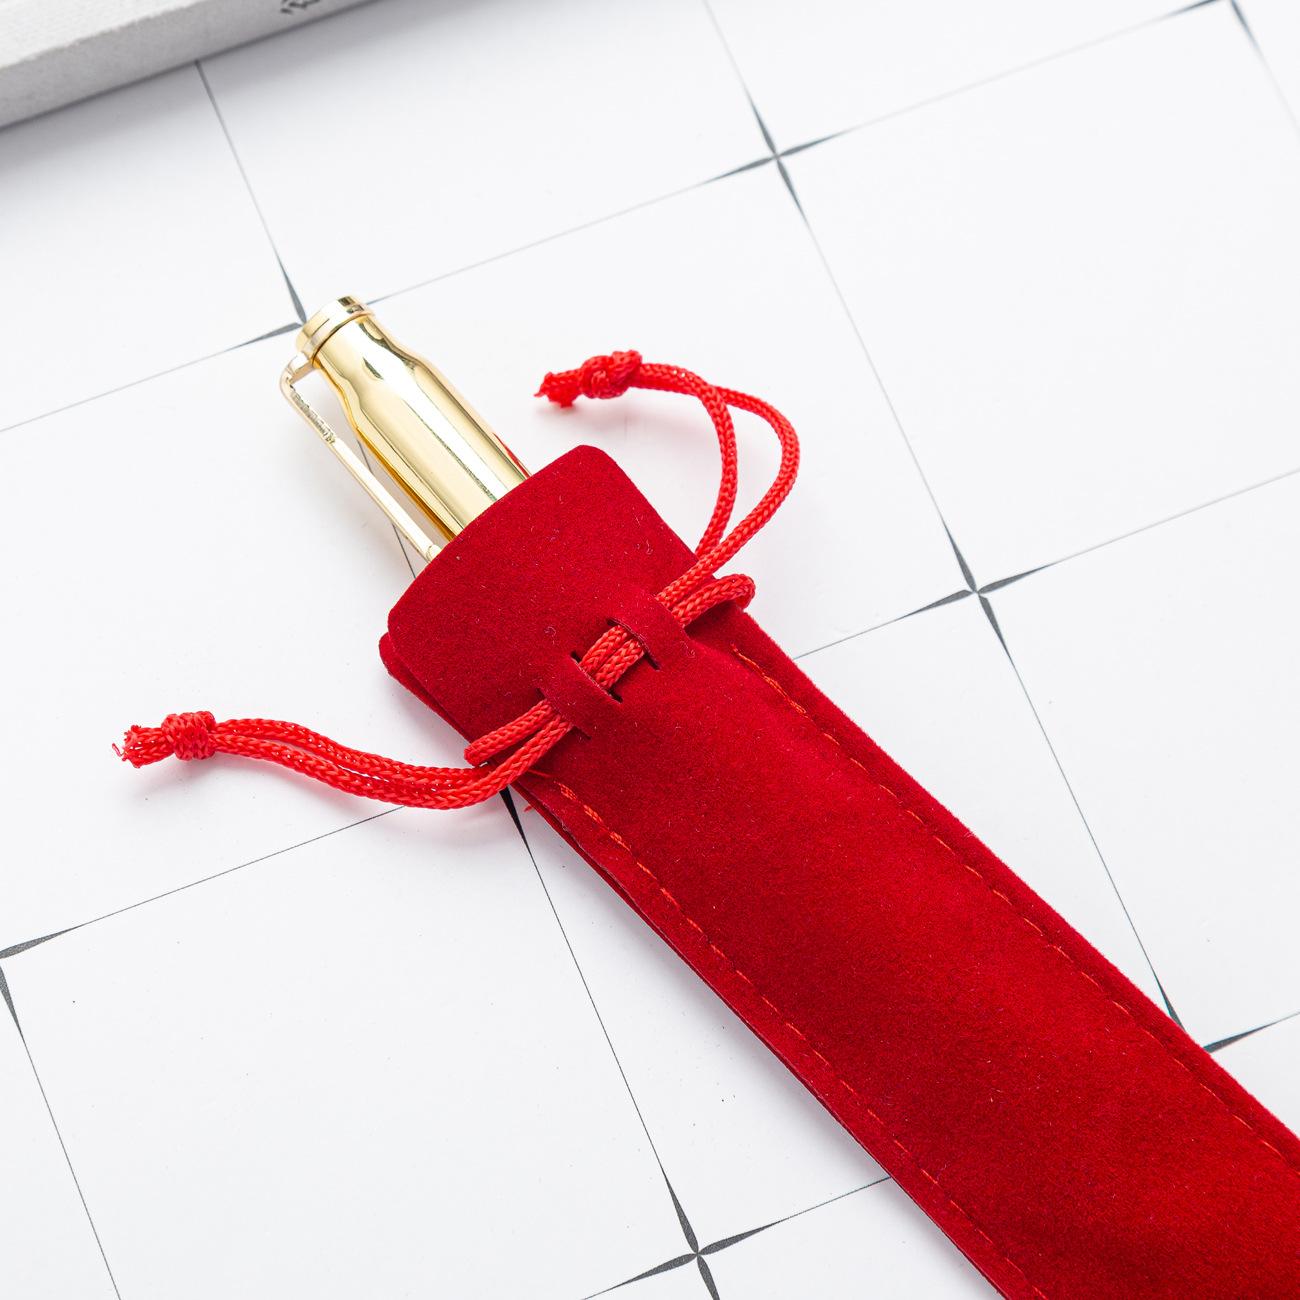 Creative Design Plush Velvet Pen Pouch Holder Single Pencil Bag Pen Case With Rope Office School Writing Supplies Student Christ